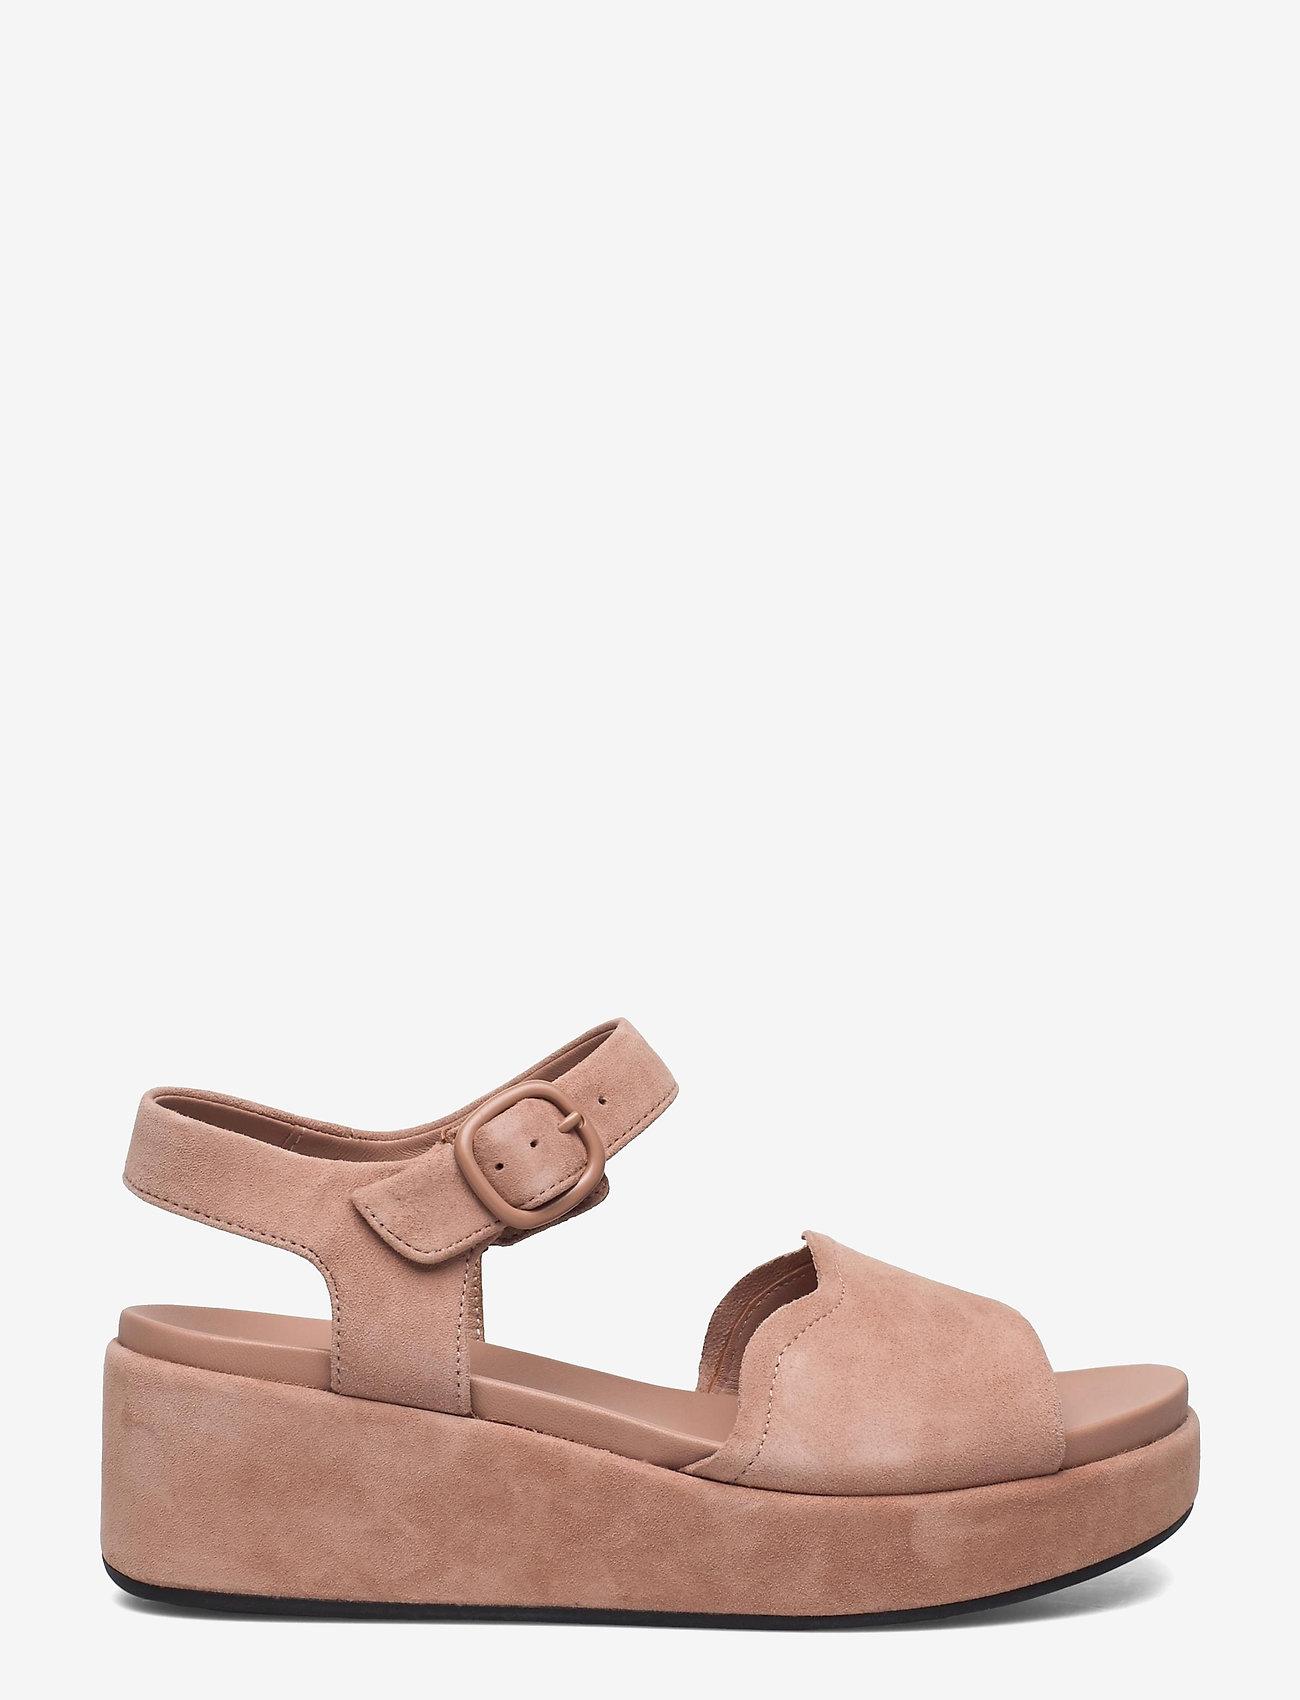 Clarks - Kimmei Way - platta sandaler - dark blush sde - 1